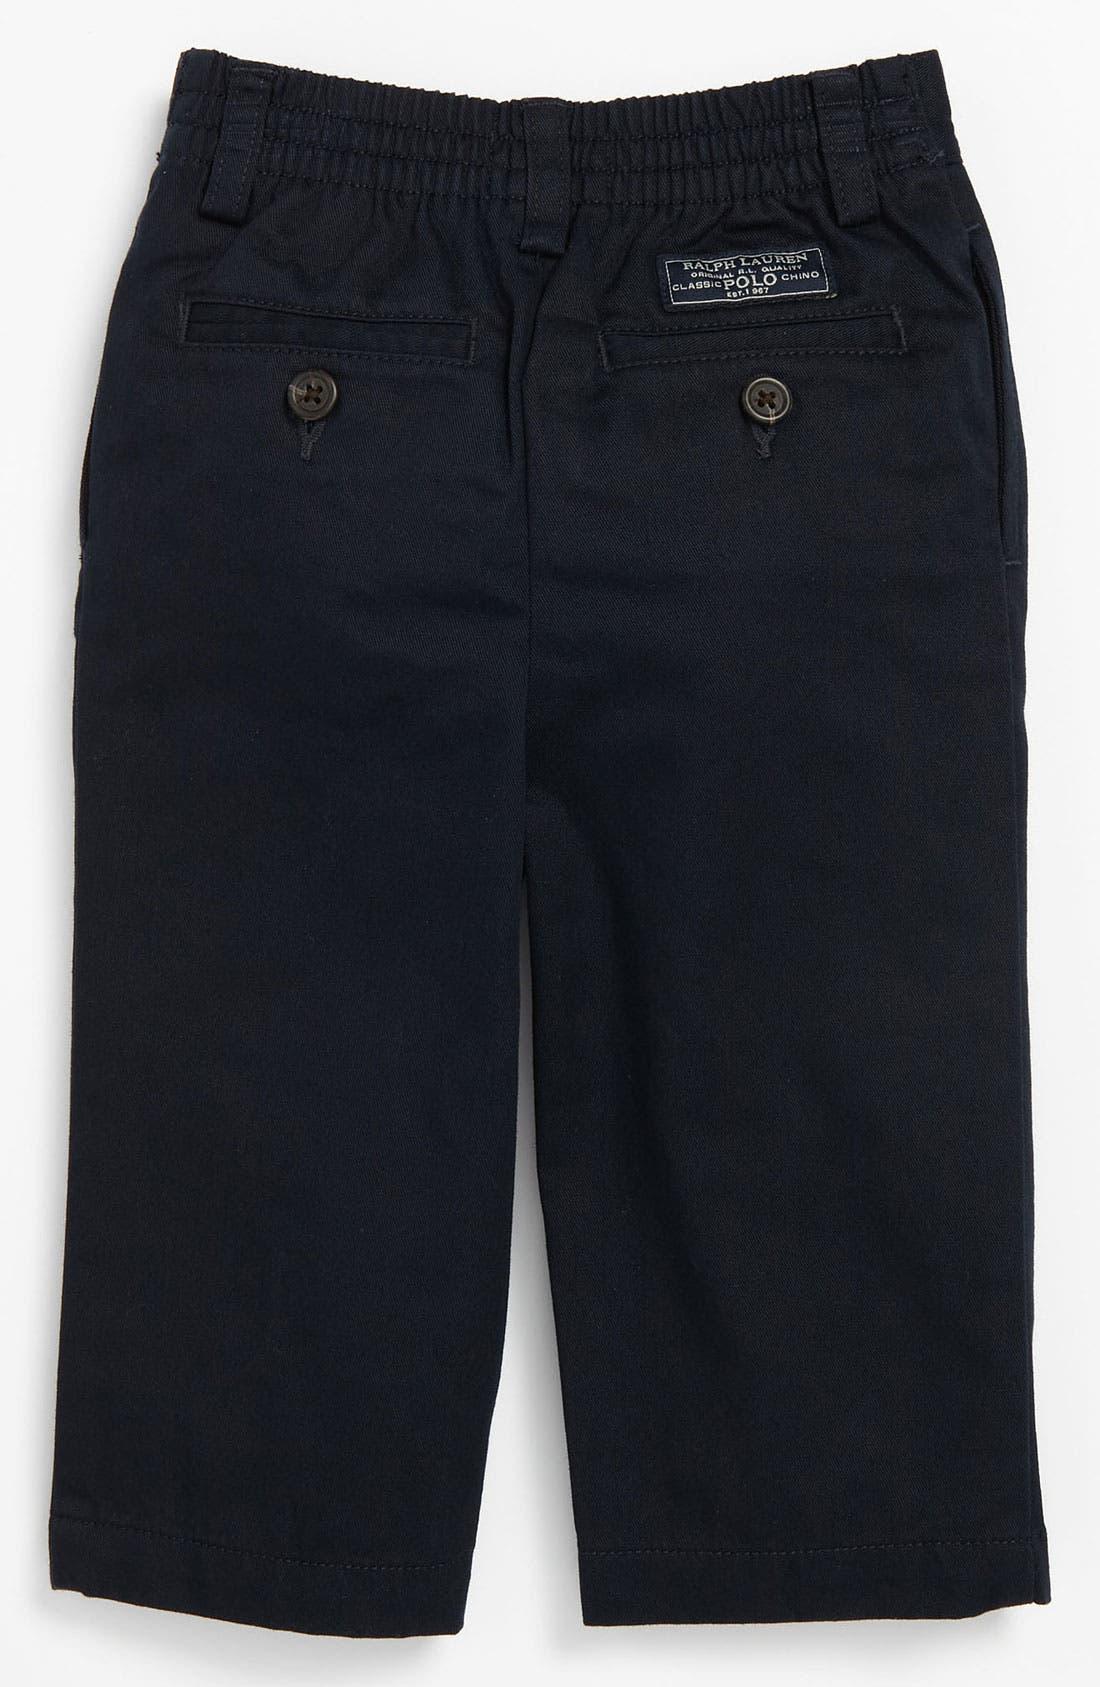 Main Image - Ralph Lauren Pleated Pants (Baby)